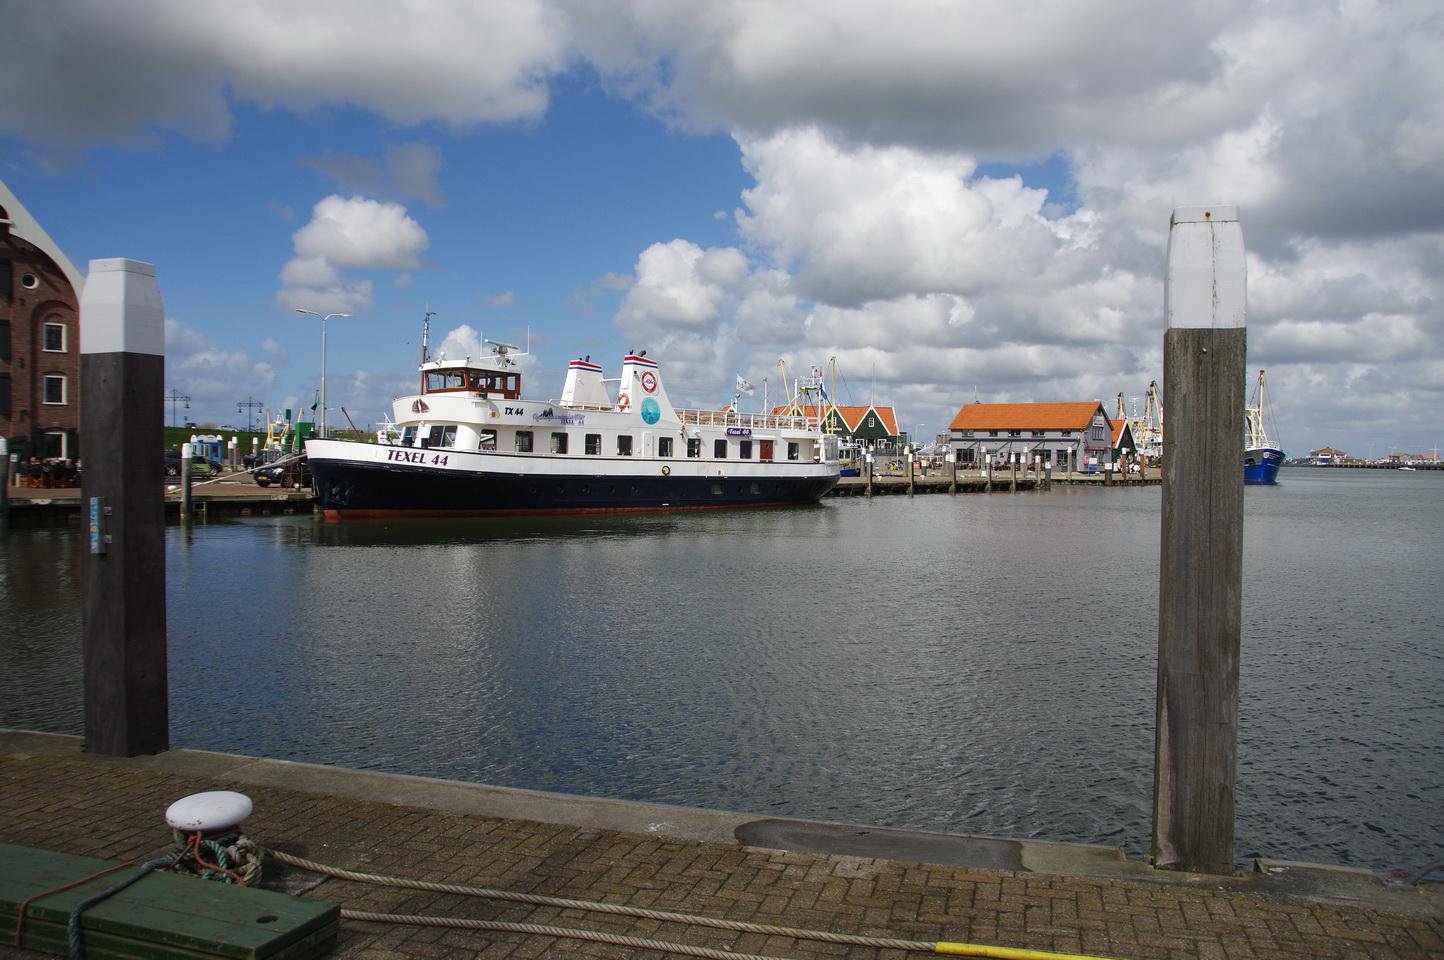 Texel - Schifffahrt Texel 44 TH 18